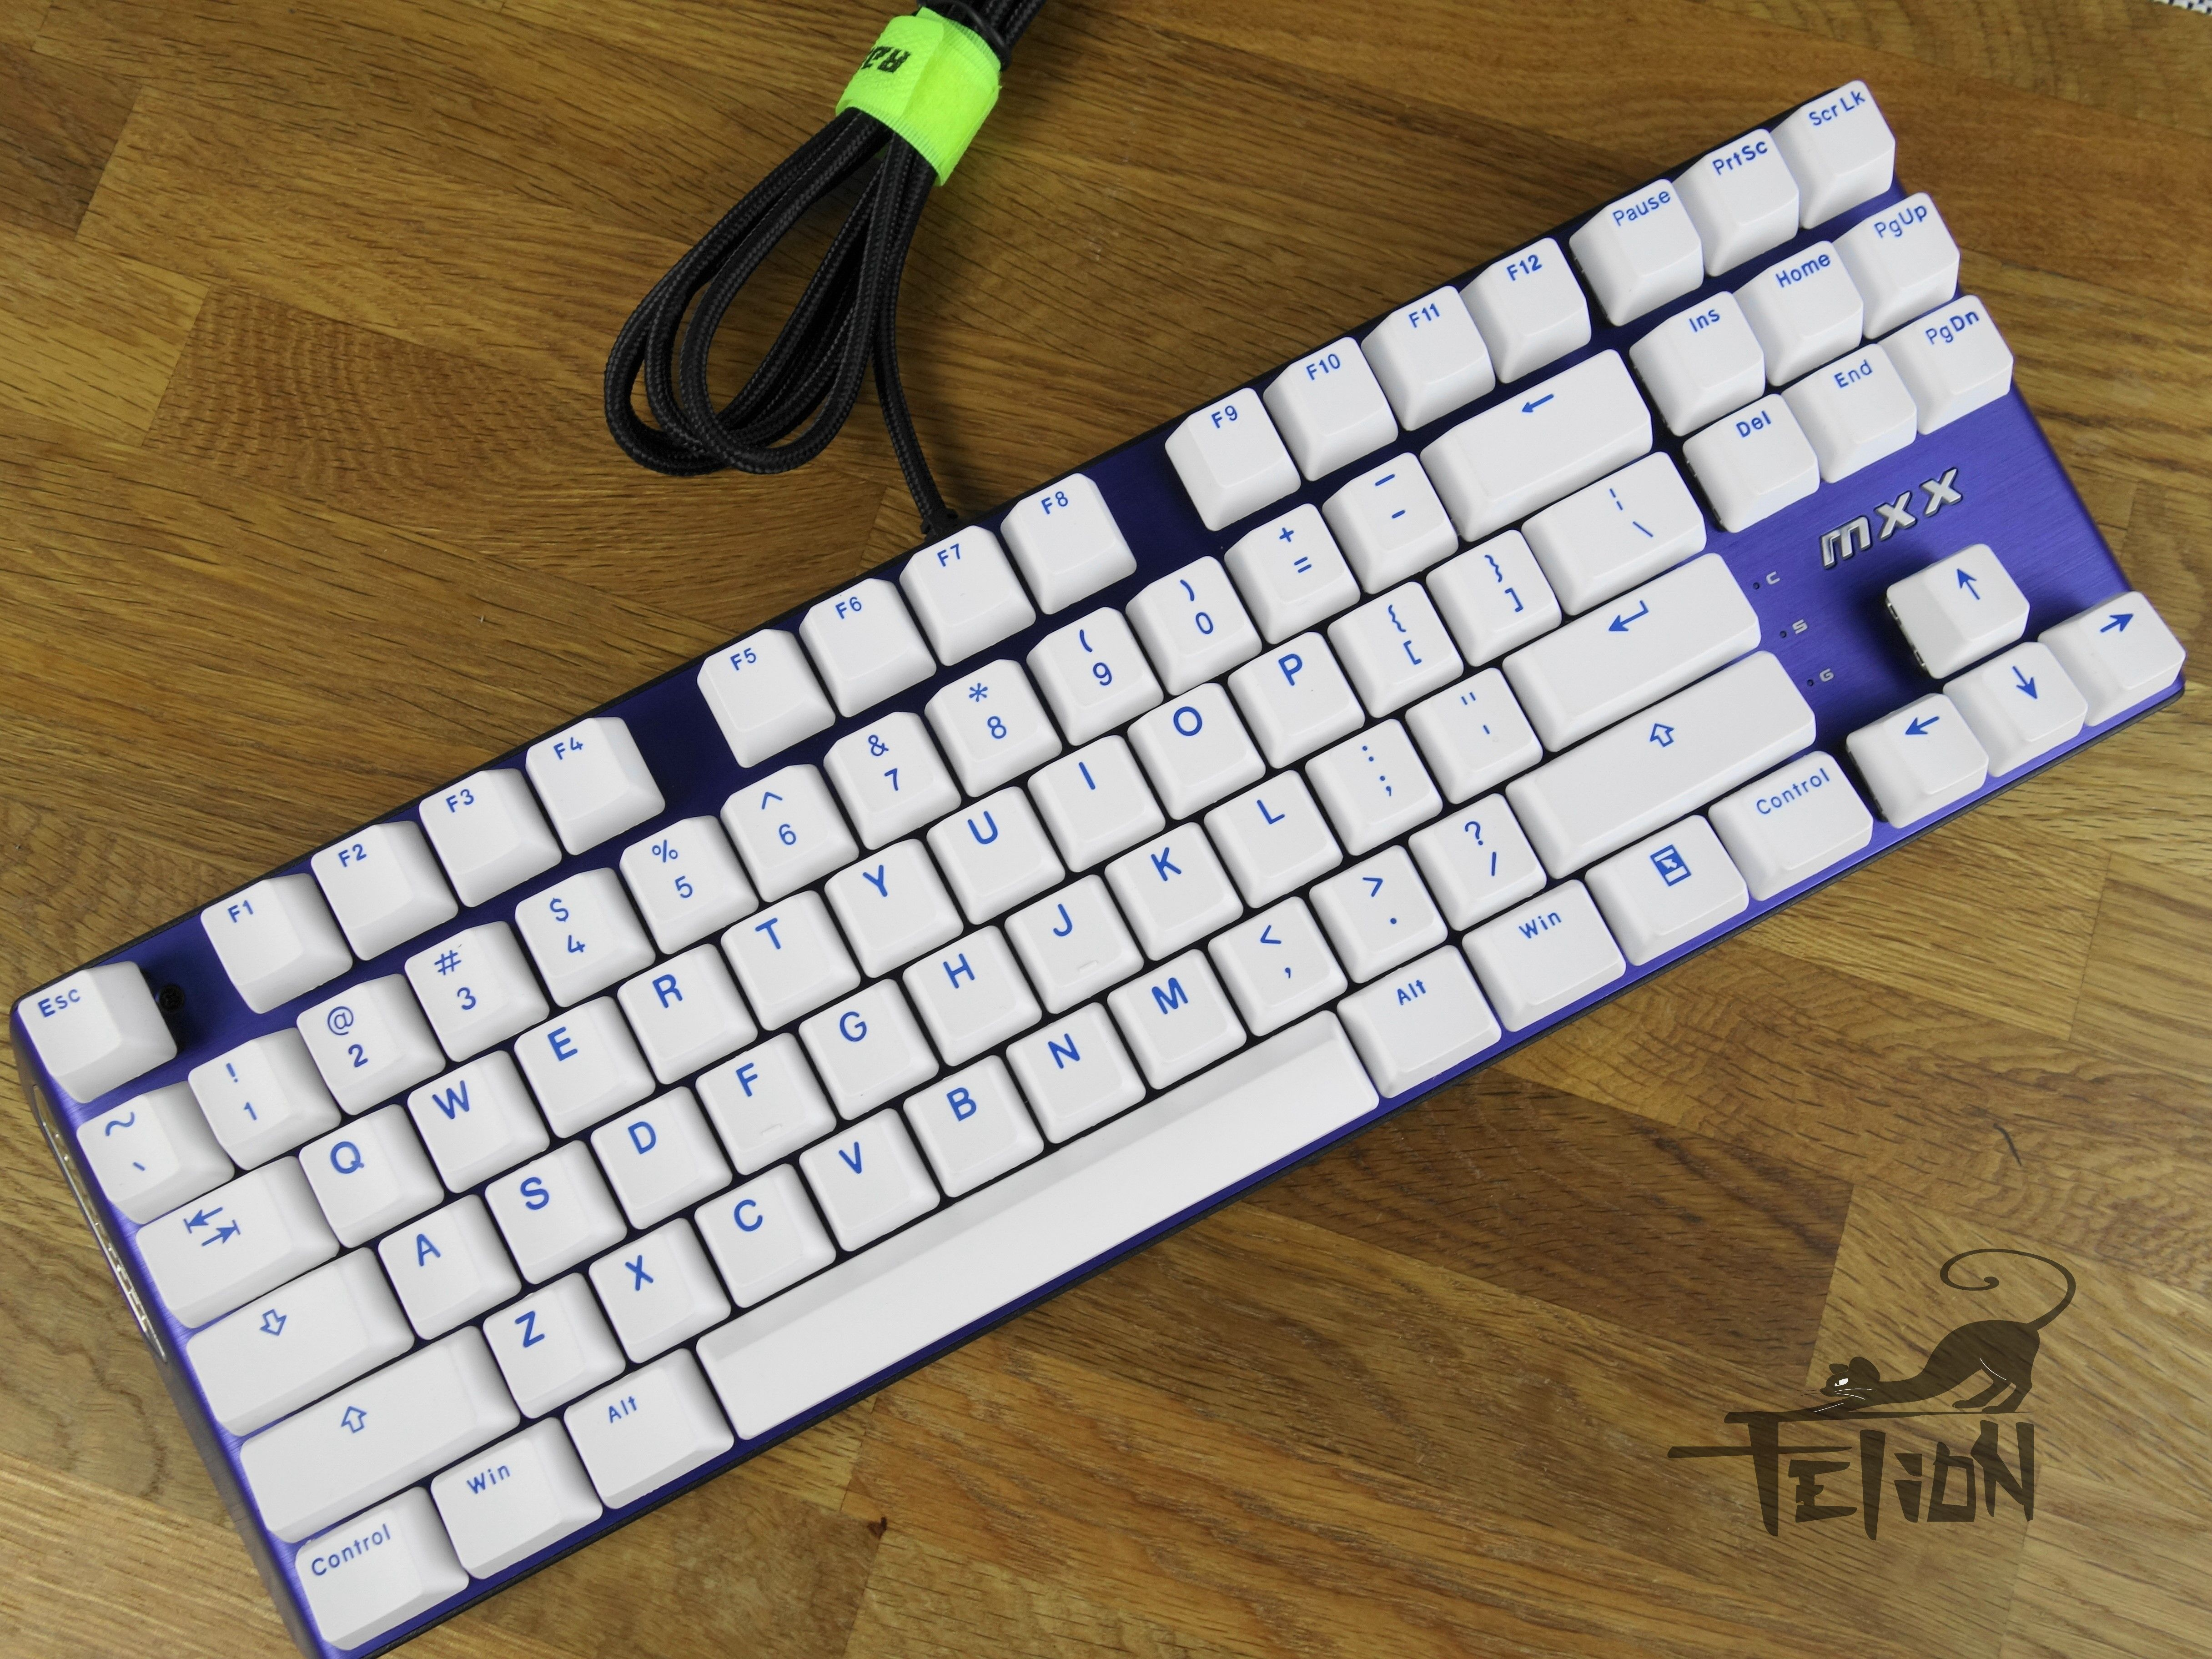 Felion1337 - Rantopad MXX DIY-TKL-Kit for the cheap bastards! | r/mk